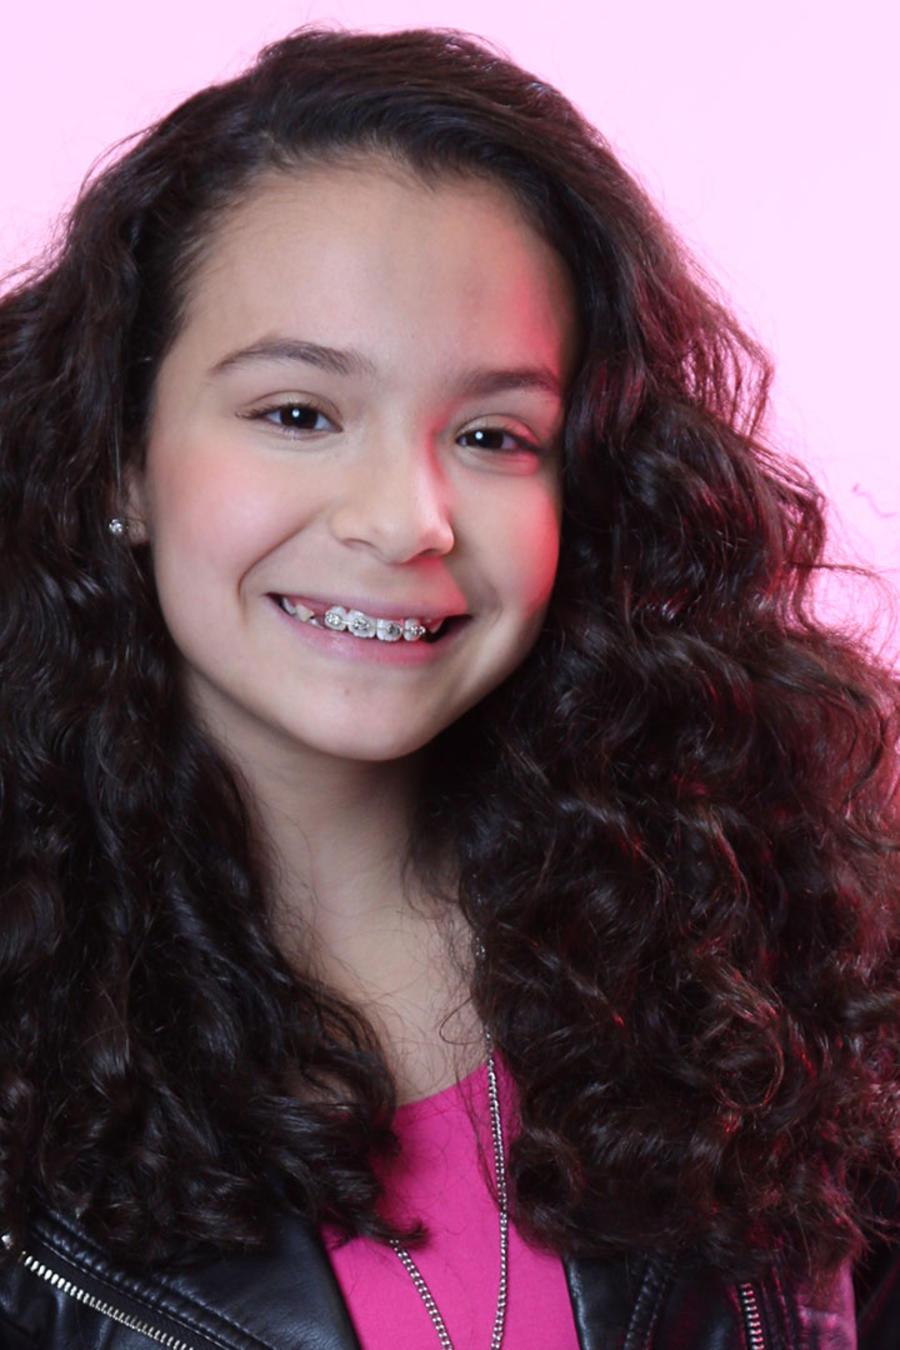 Manuela Maria del Team Natalia en La Voz Kids